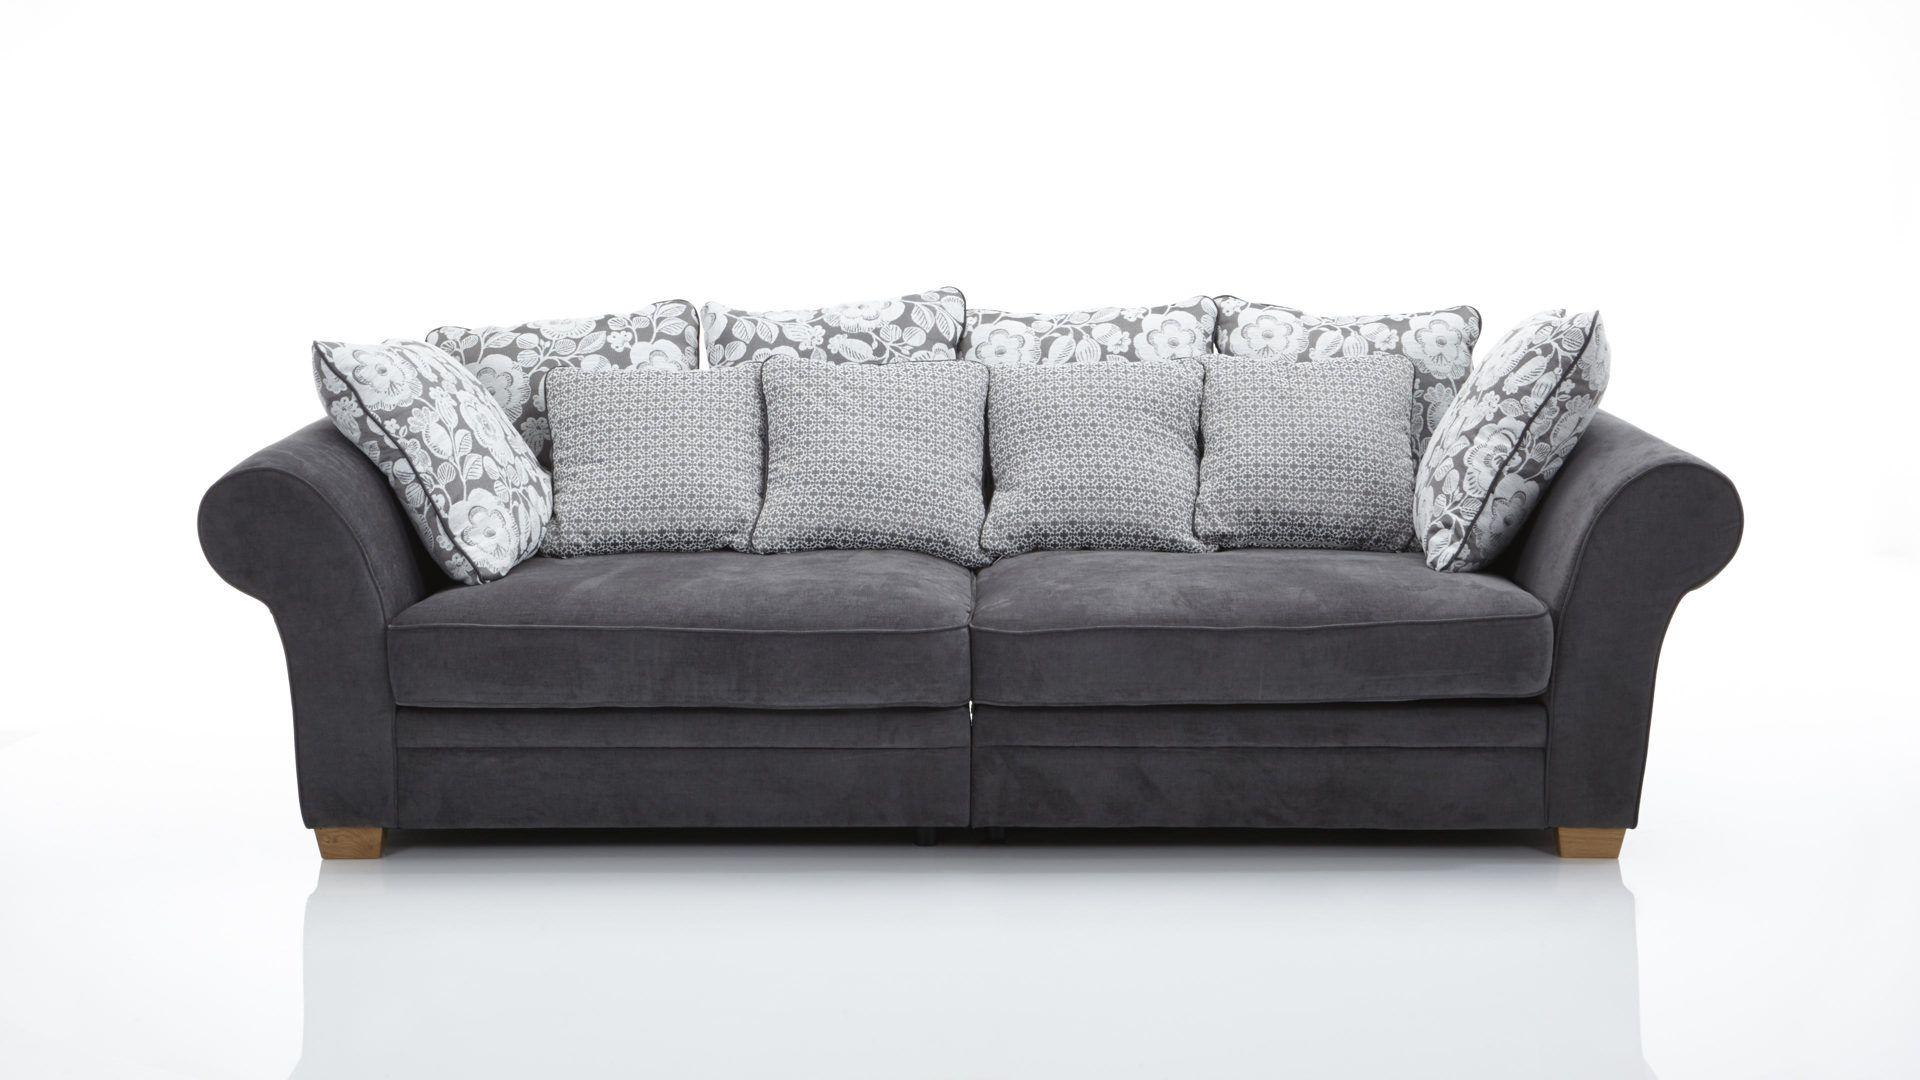 Möbel Staude Mega Sofa im modernen Landhausstil